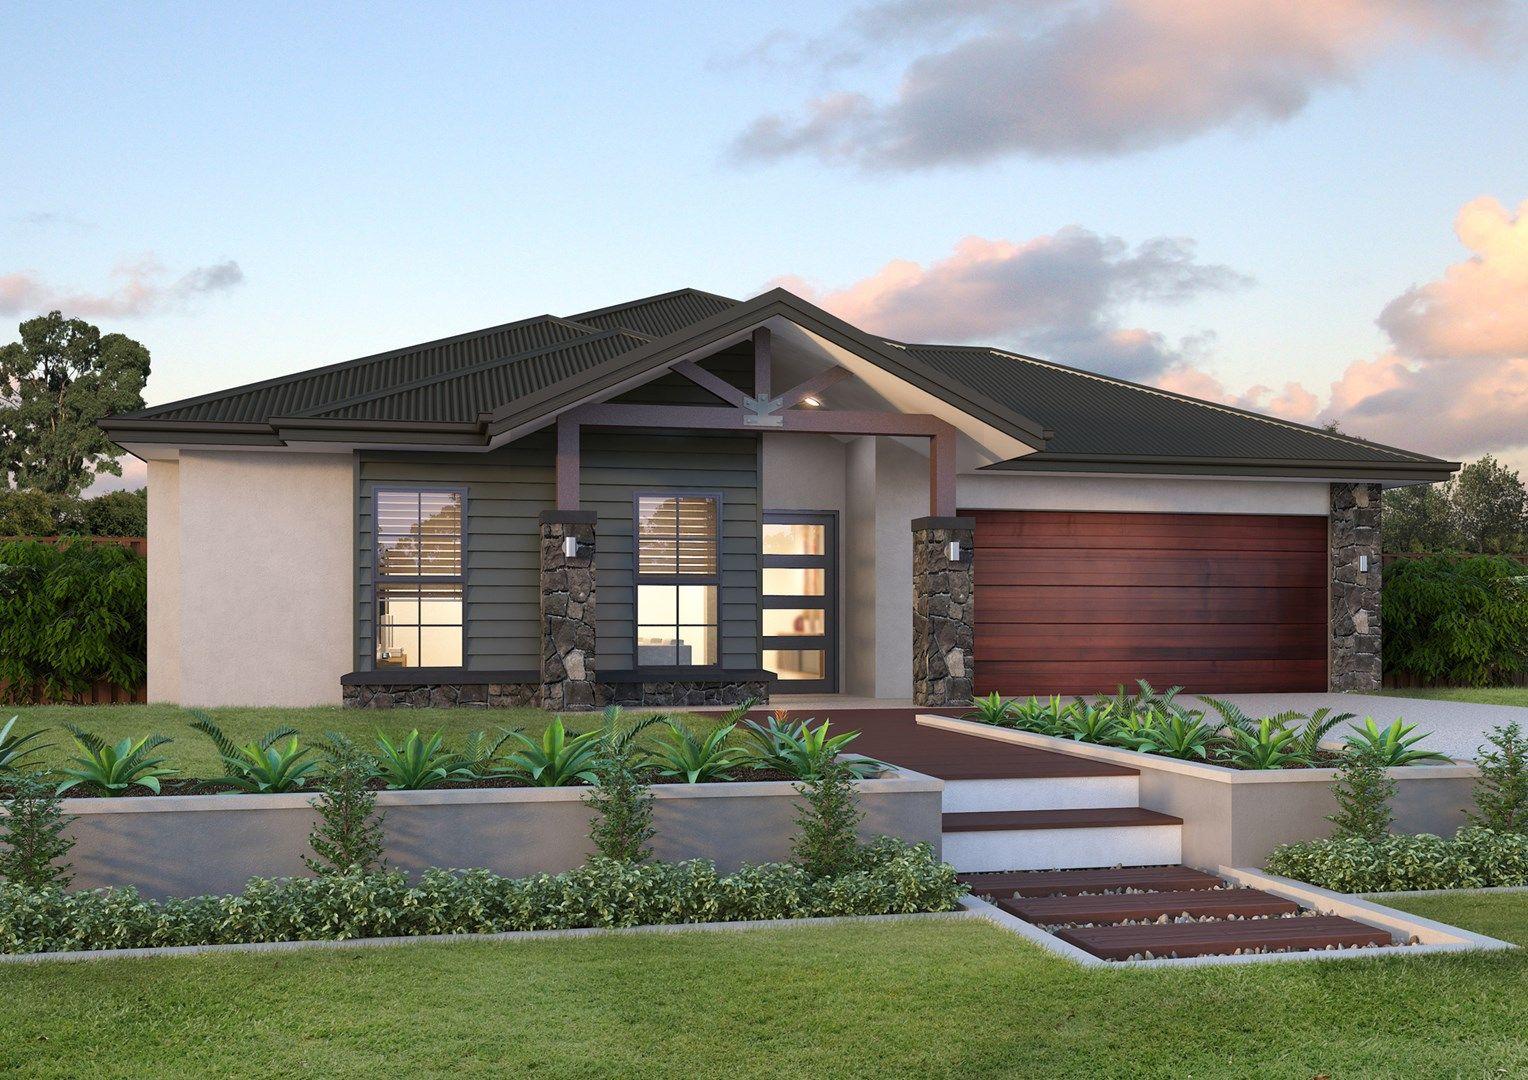 L390 McBurnie Avenue 'THE AVENUES', Highfields QLD 4352, Image 0